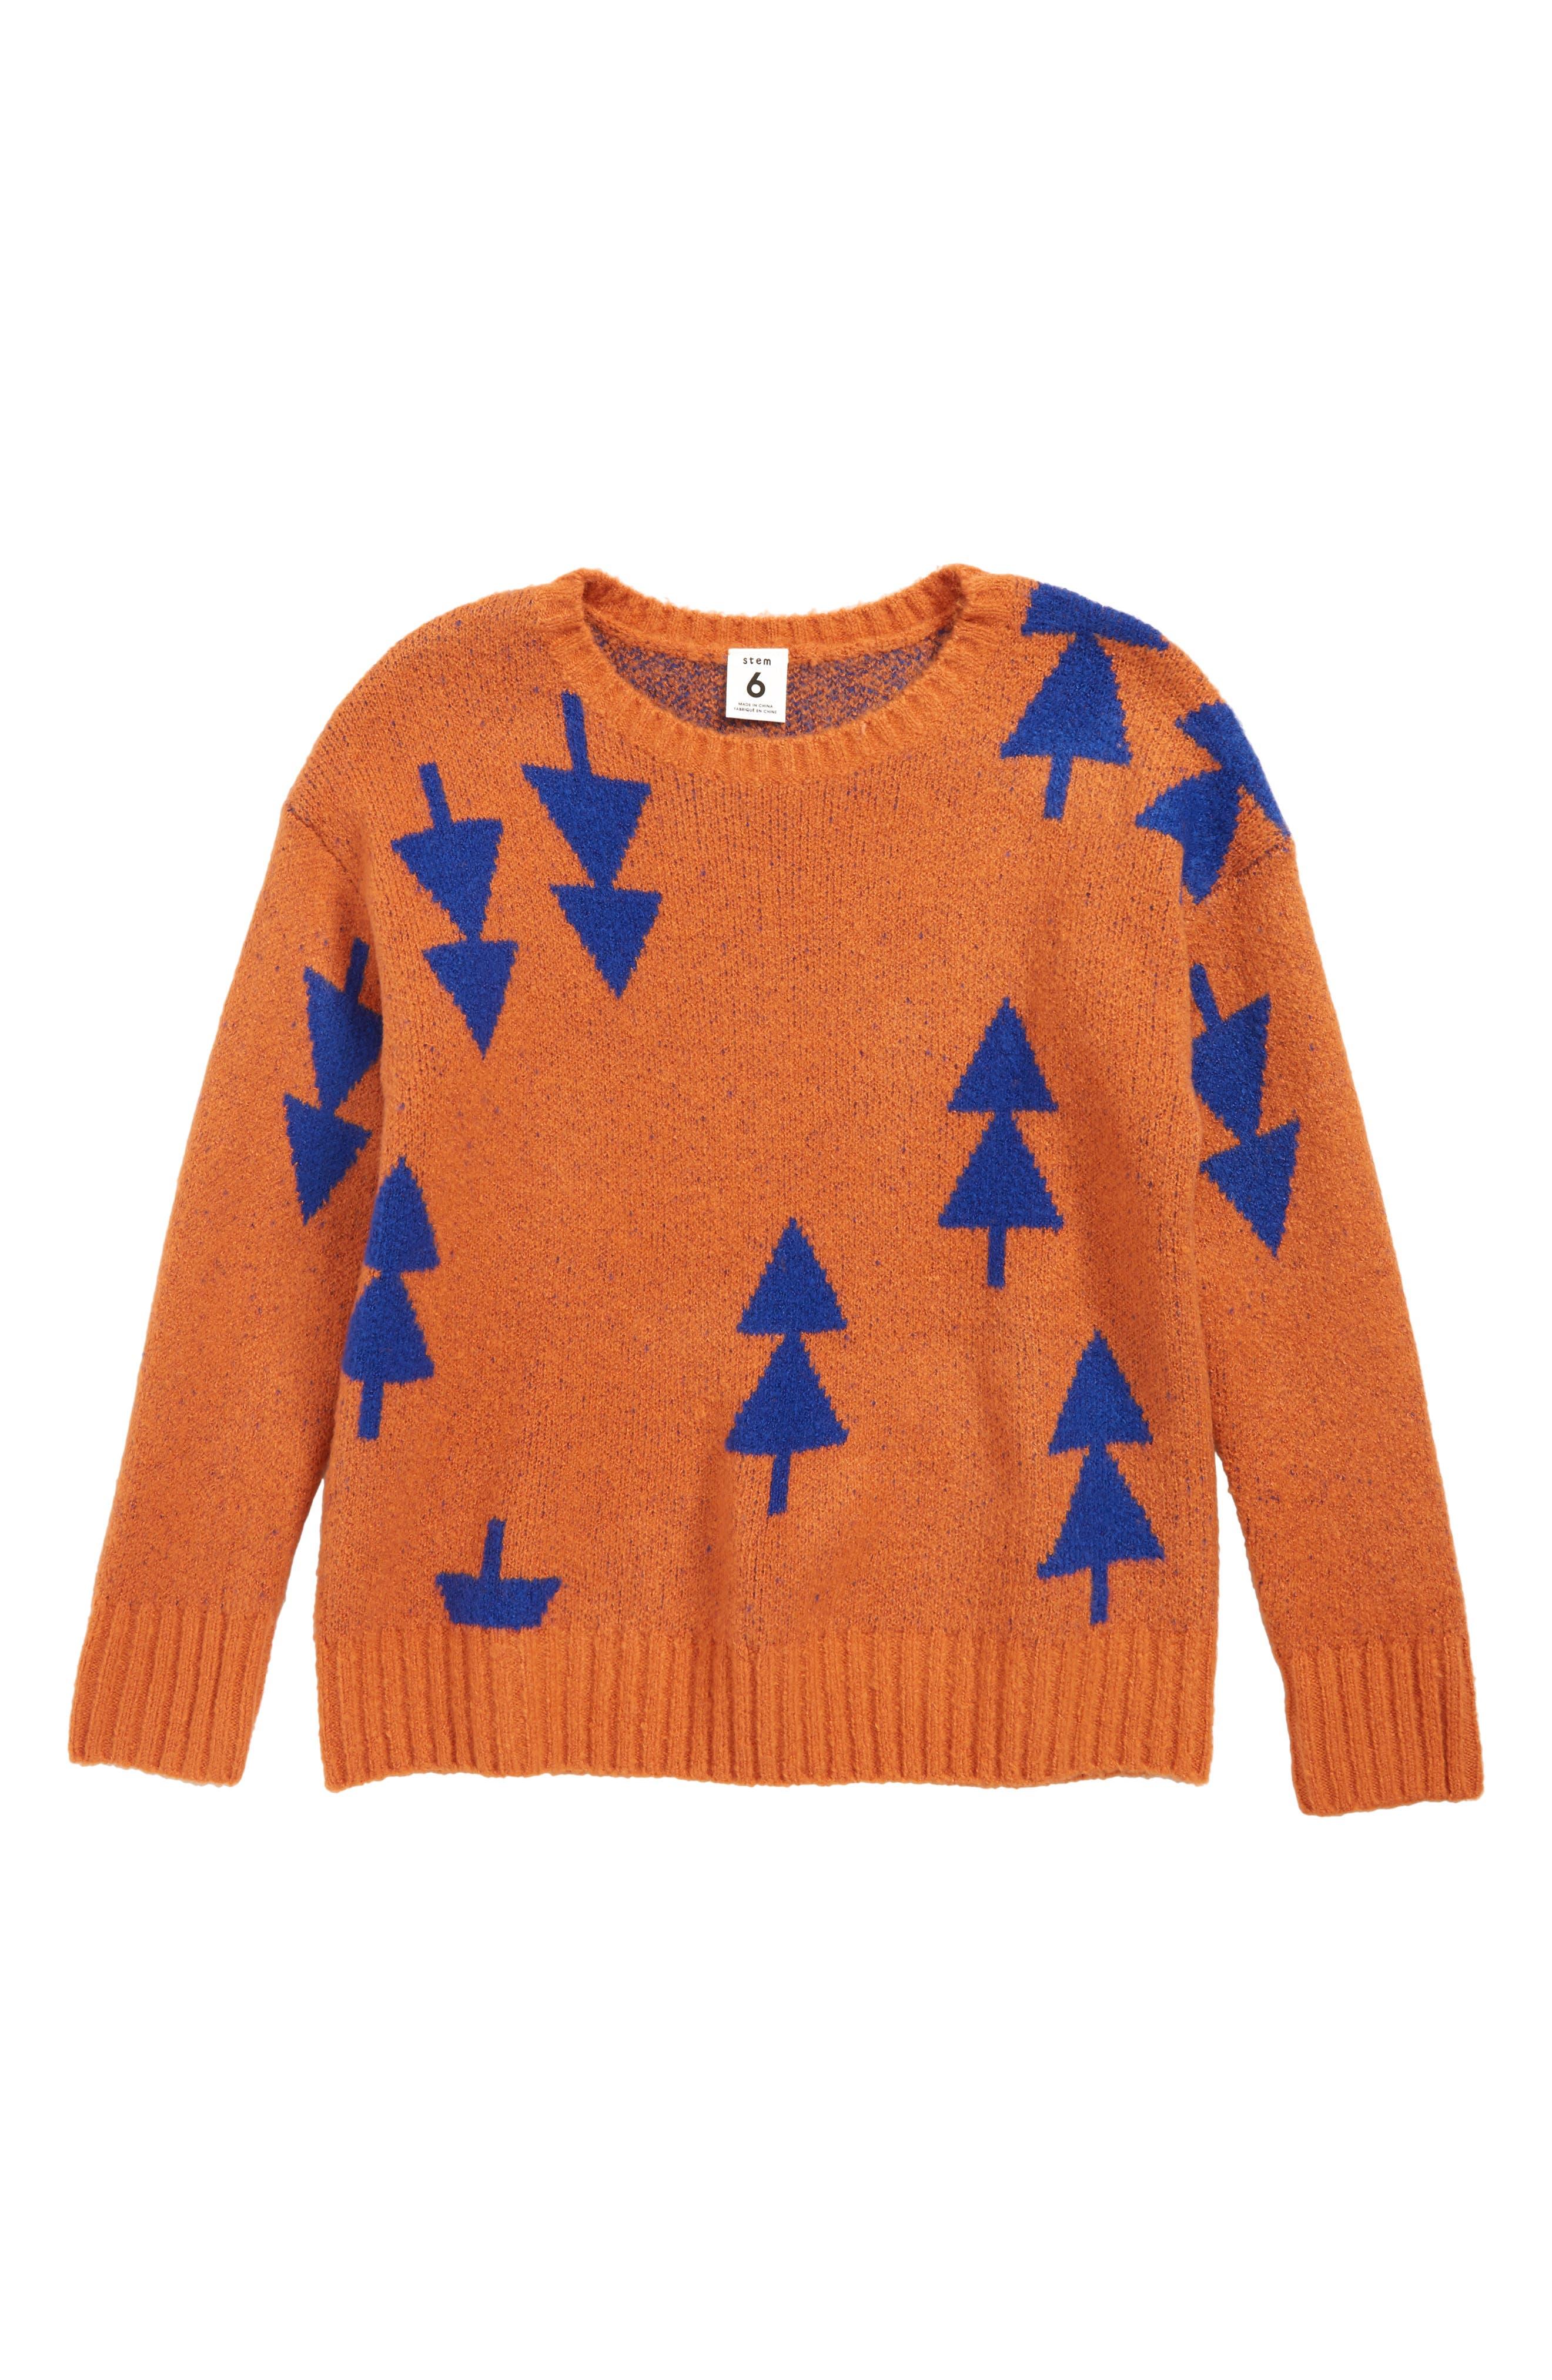 Intarsia Sweater,                             Main thumbnail 1, color,                             RUST LEAF- BLUE GEO TREES